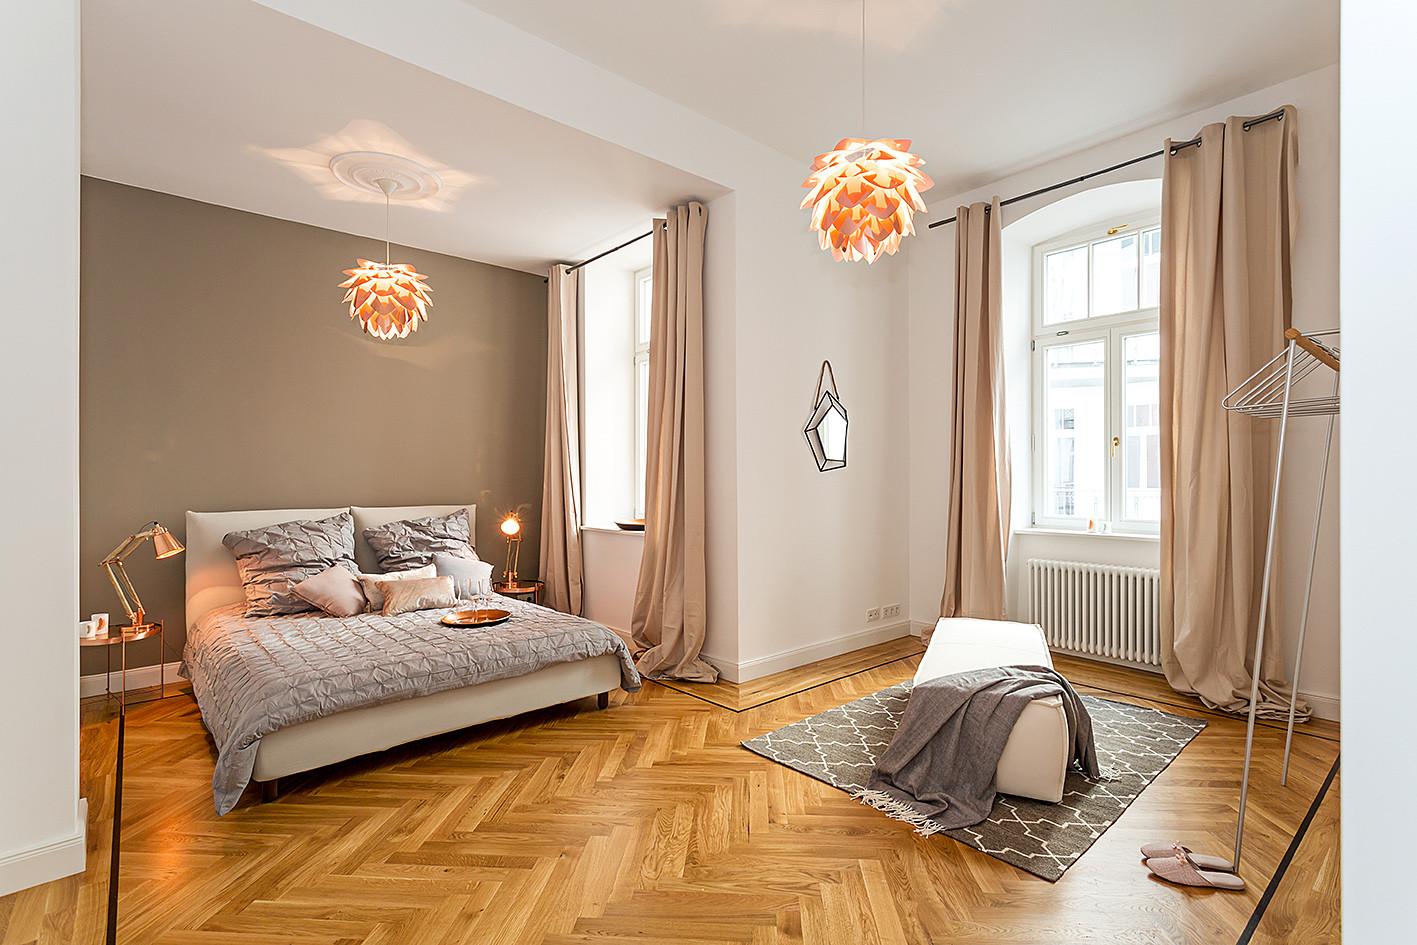 gallery home staging staged homes birgit brauer ziem. Black Bedroom Furniture Sets. Home Design Ideas